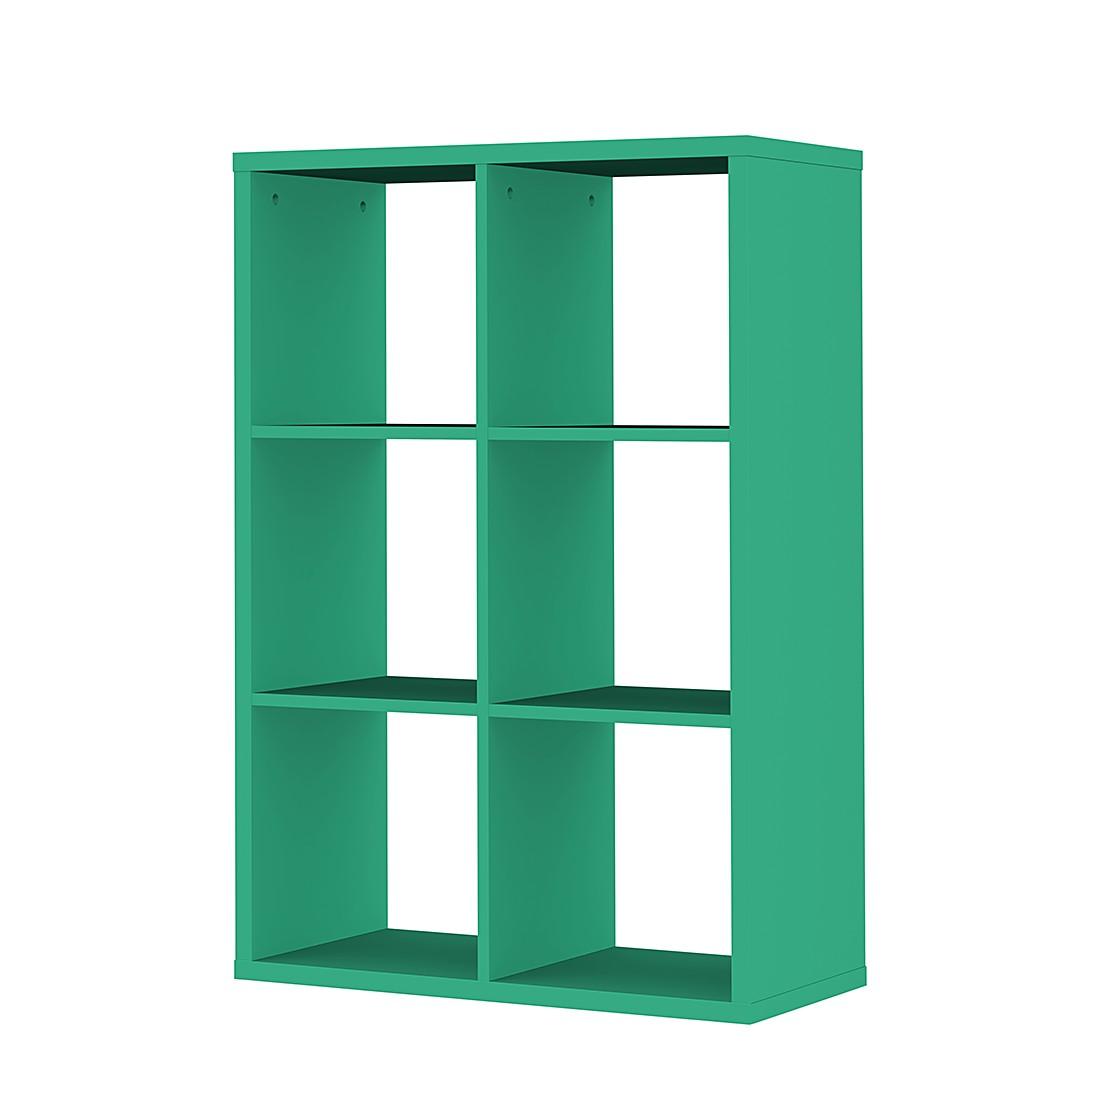 kleinm bel regale b cherregale archive tipps vom. Black Bedroom Furniture Sets. Home Design Ideas